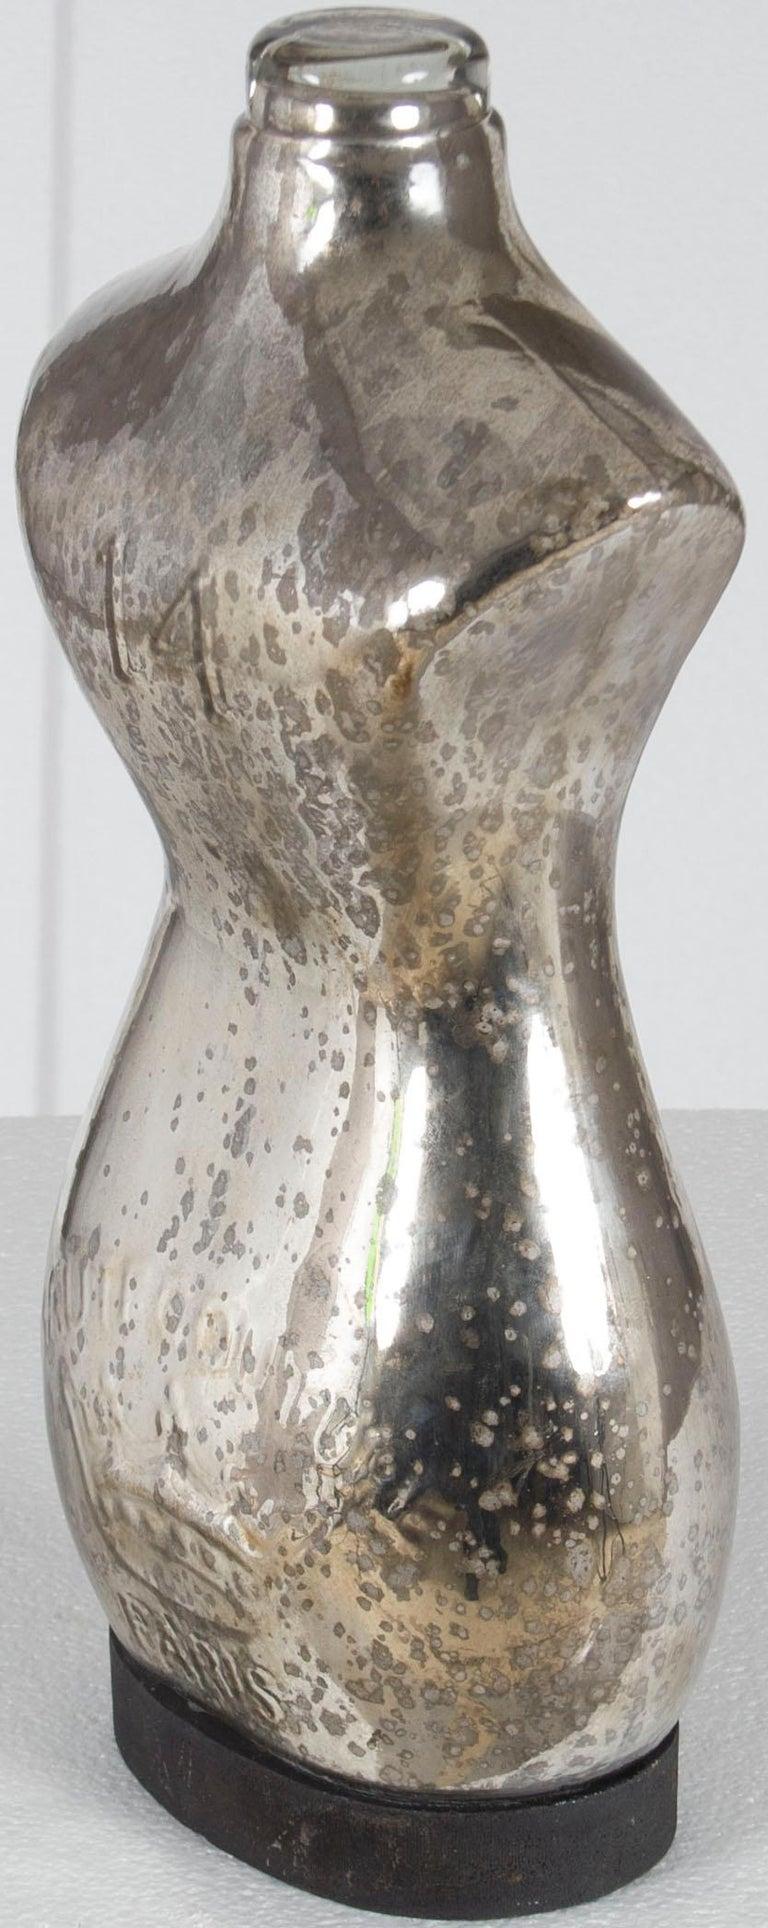 Vintage Style Small Glass Decorative Mannequin Statue In New Condition For Sale In Atlanta, GA